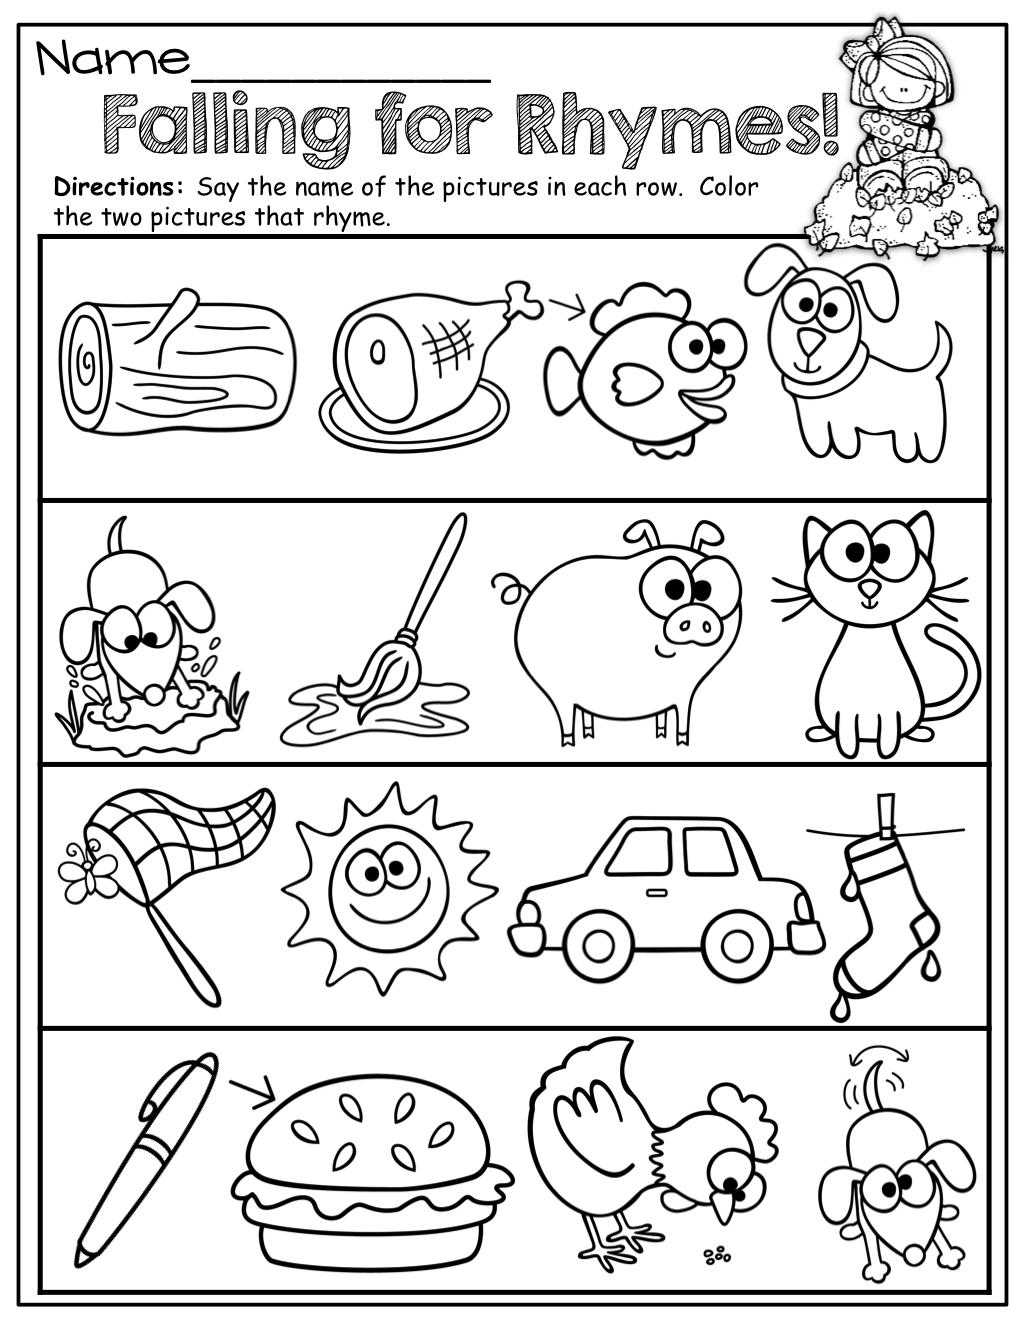 Fascinating Rhyming Worksheets For Kindergarten Free About